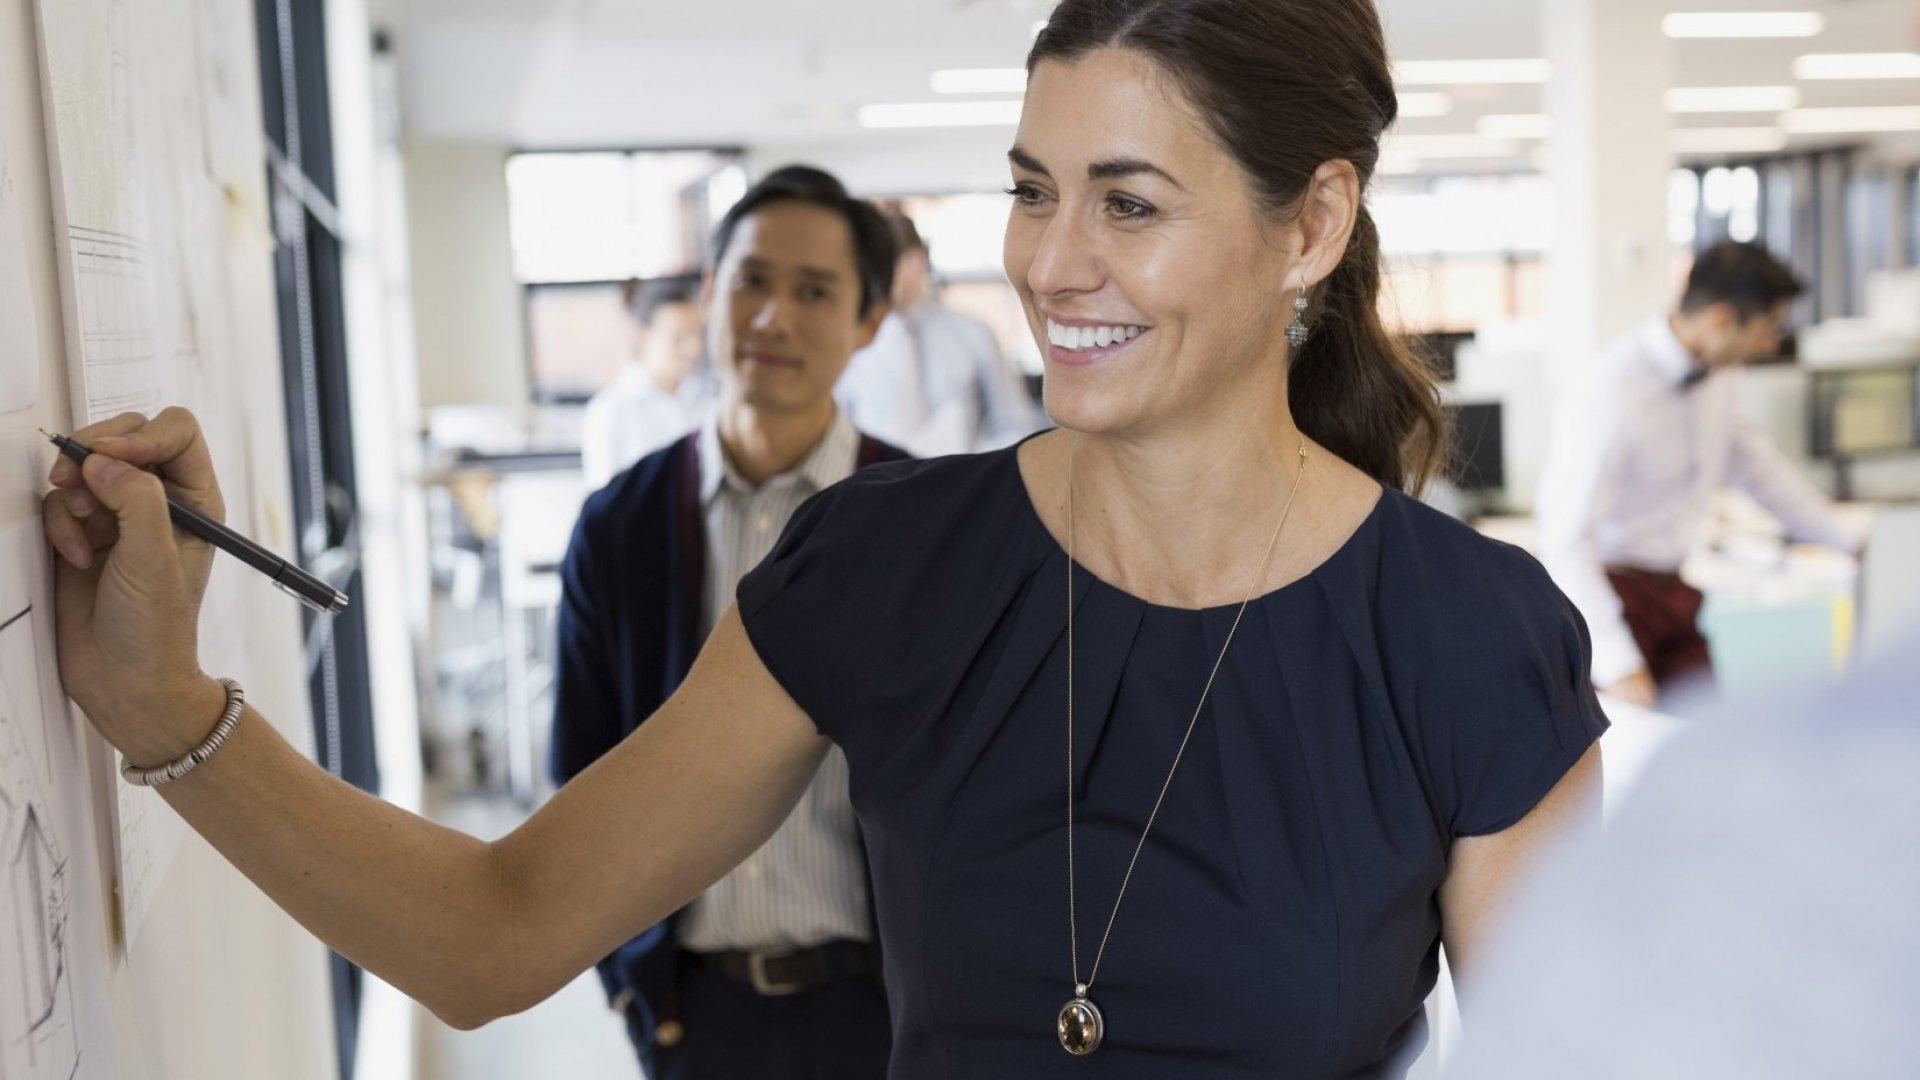 Why Entrepreneurs Make Awesome Employees